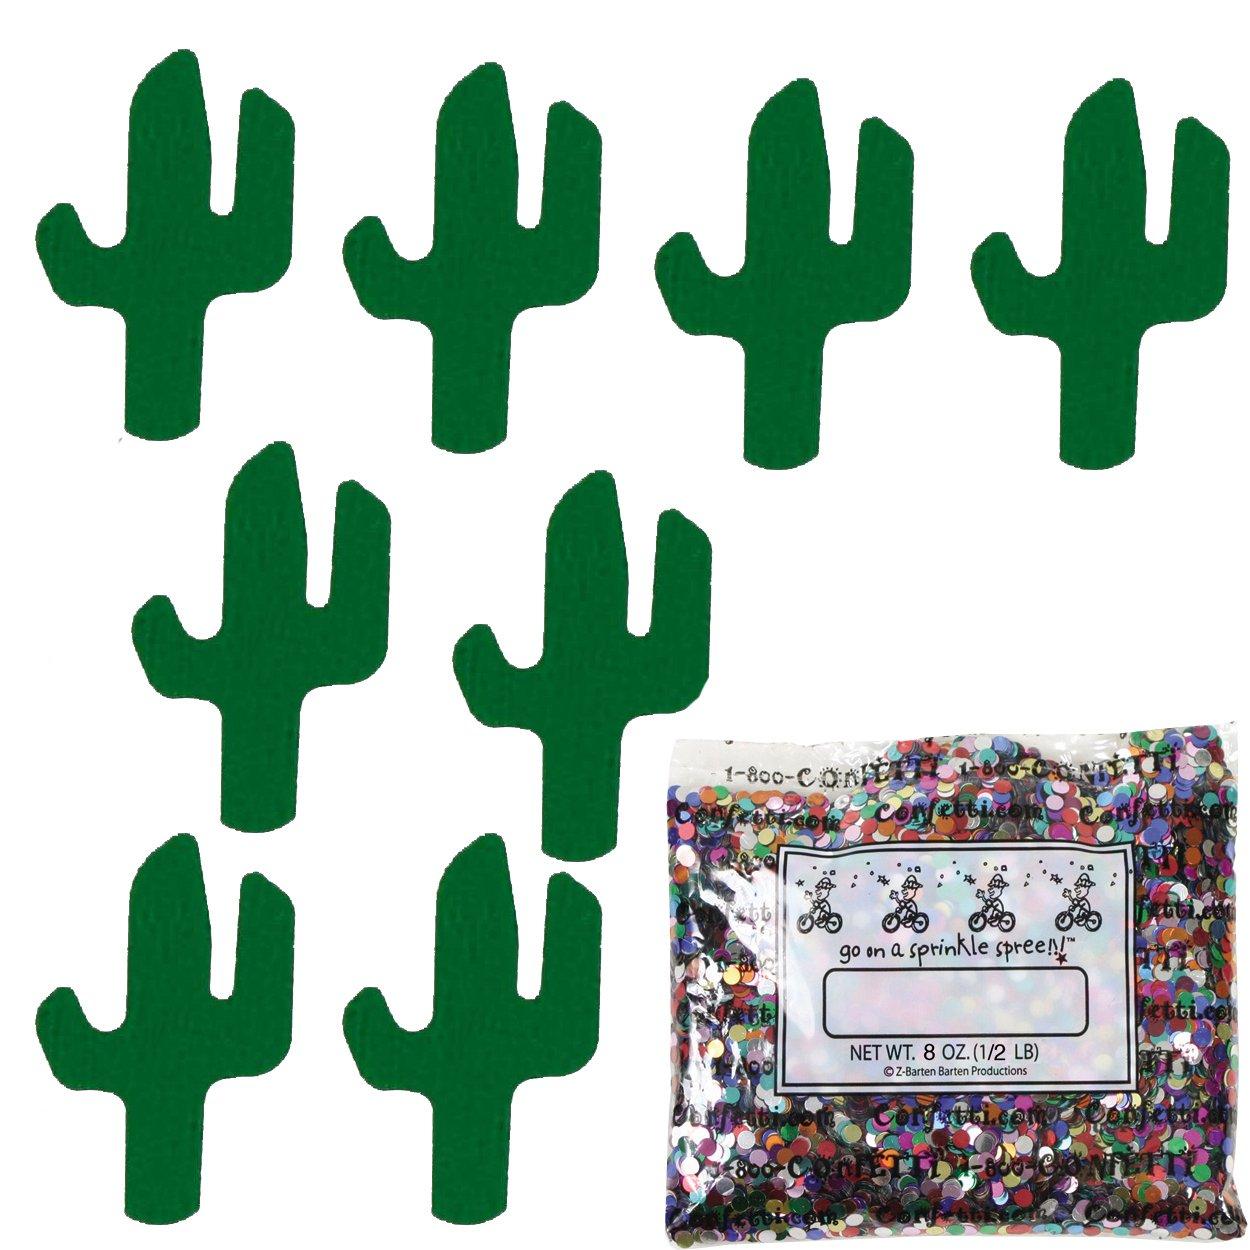 Confetti Cactus Green - One Pound (16 oz) Free Priority Mail (8745)